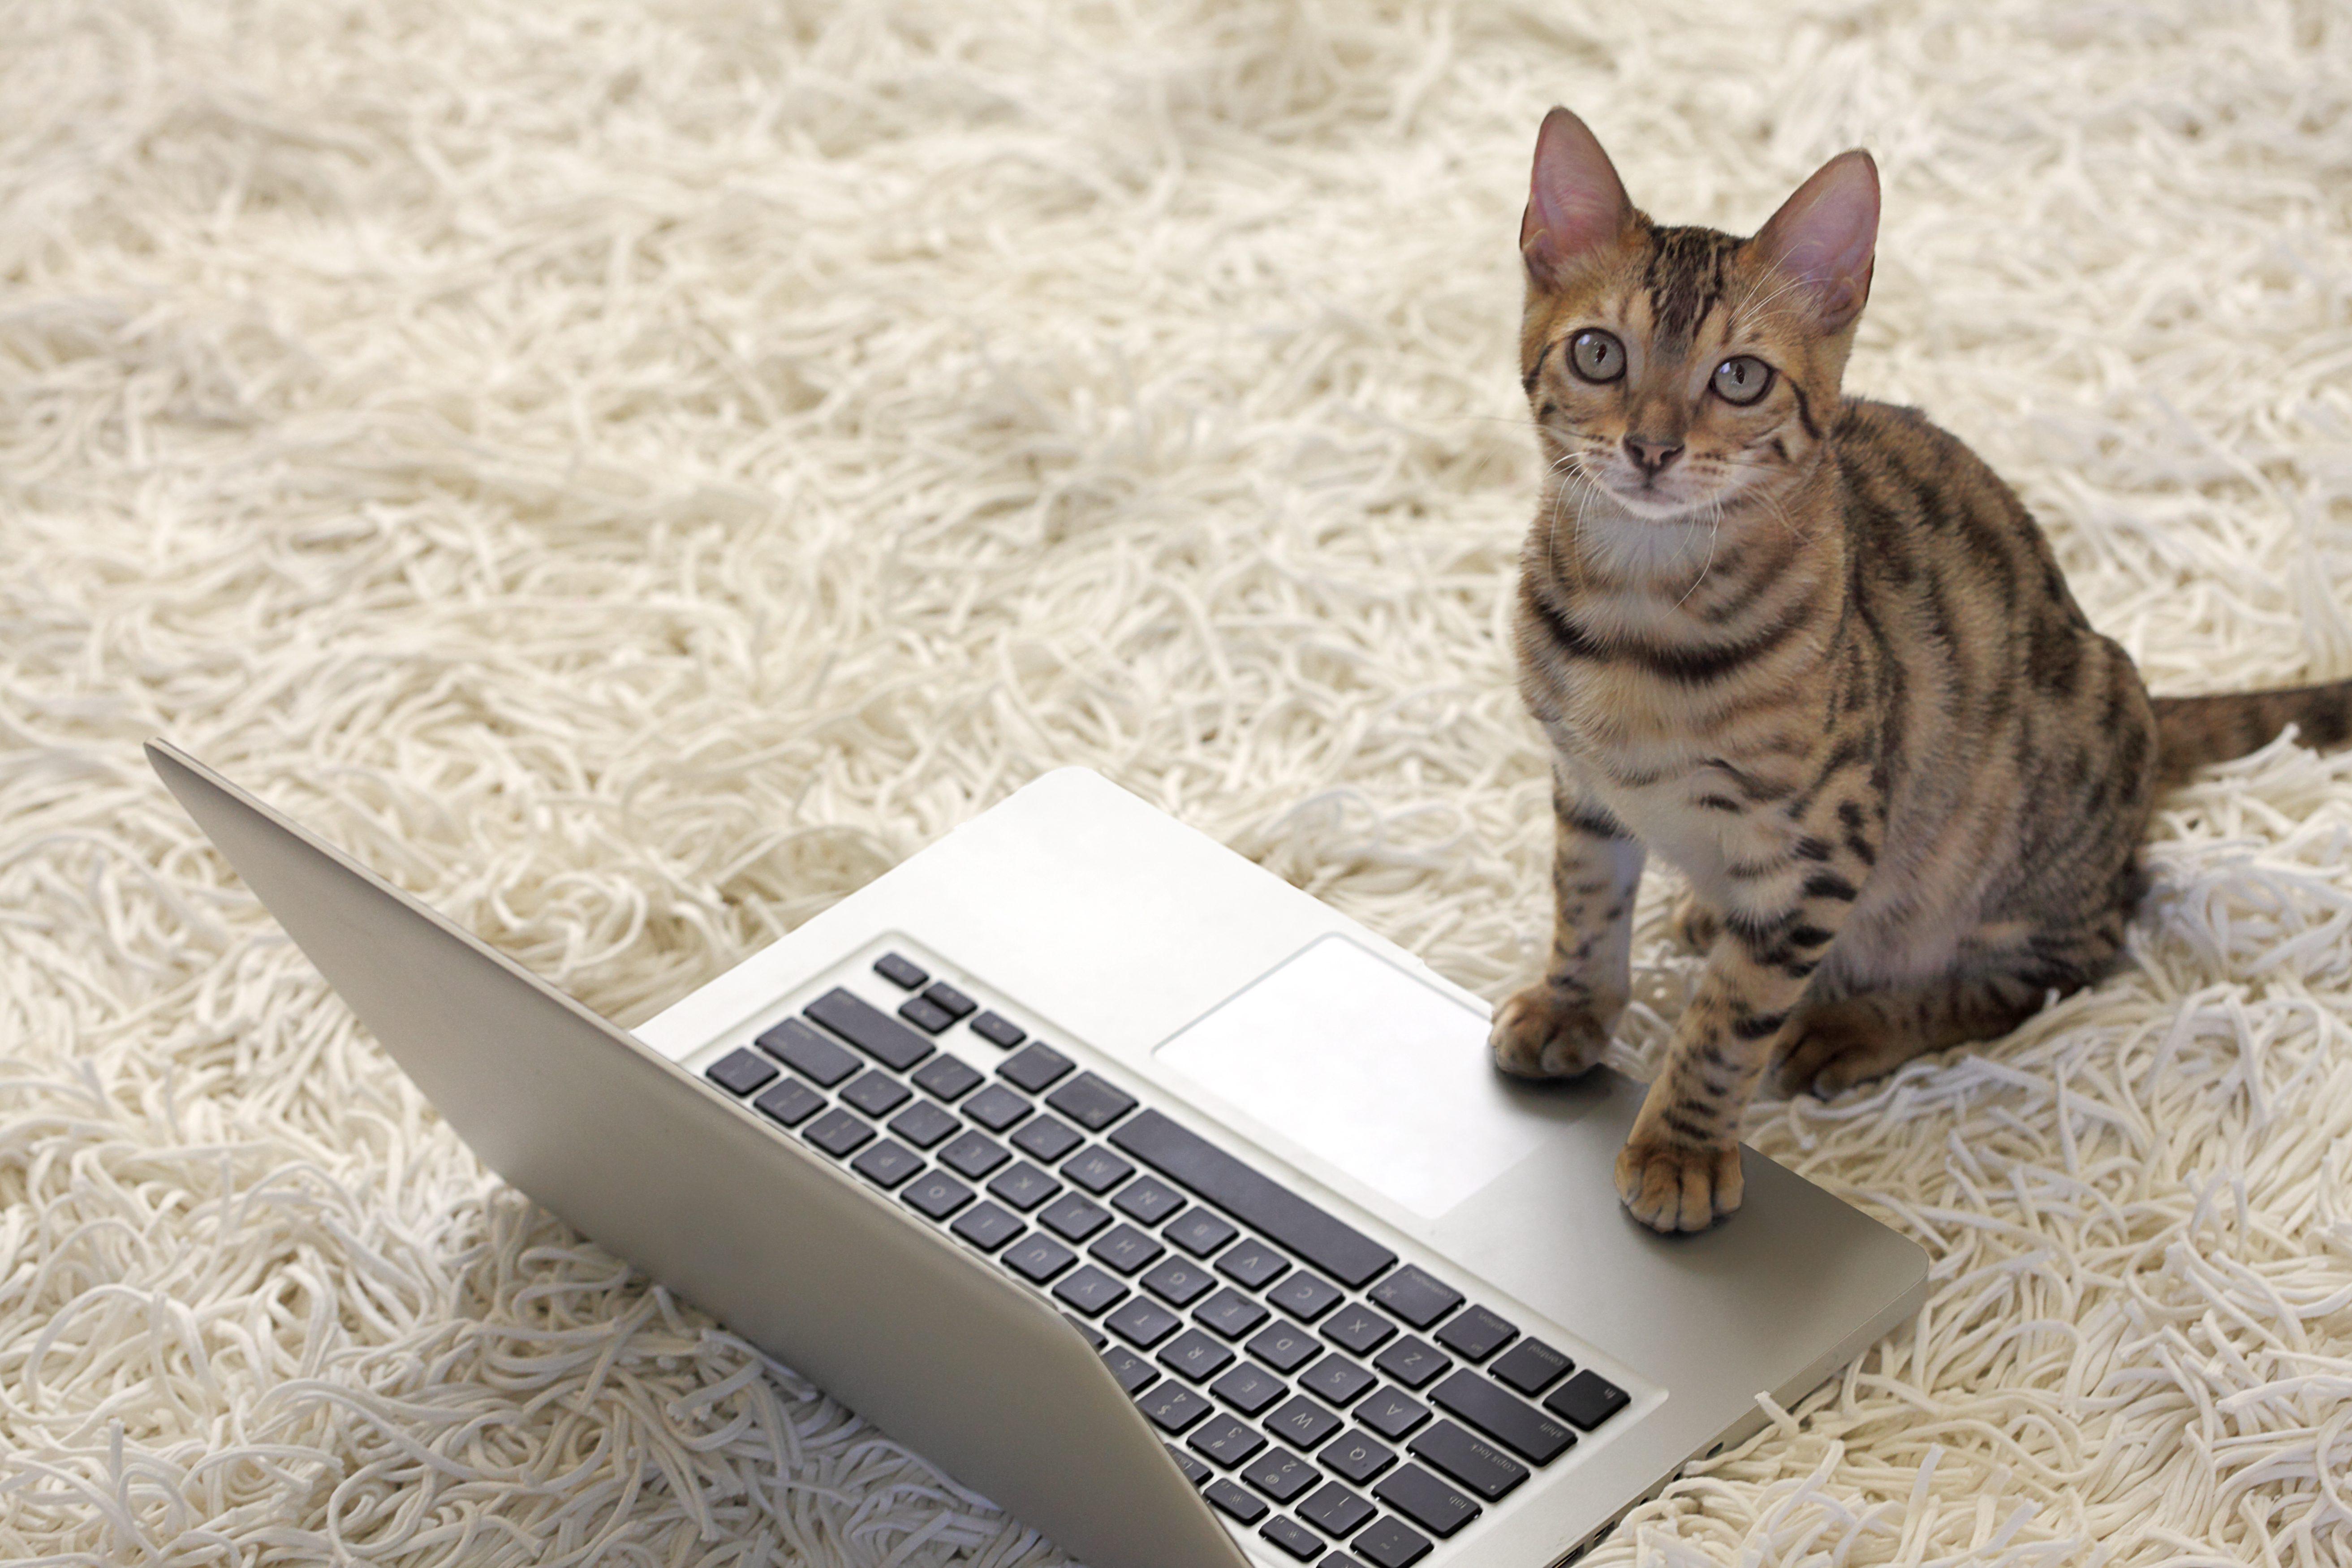 Bengal Cat with Laptop Computer